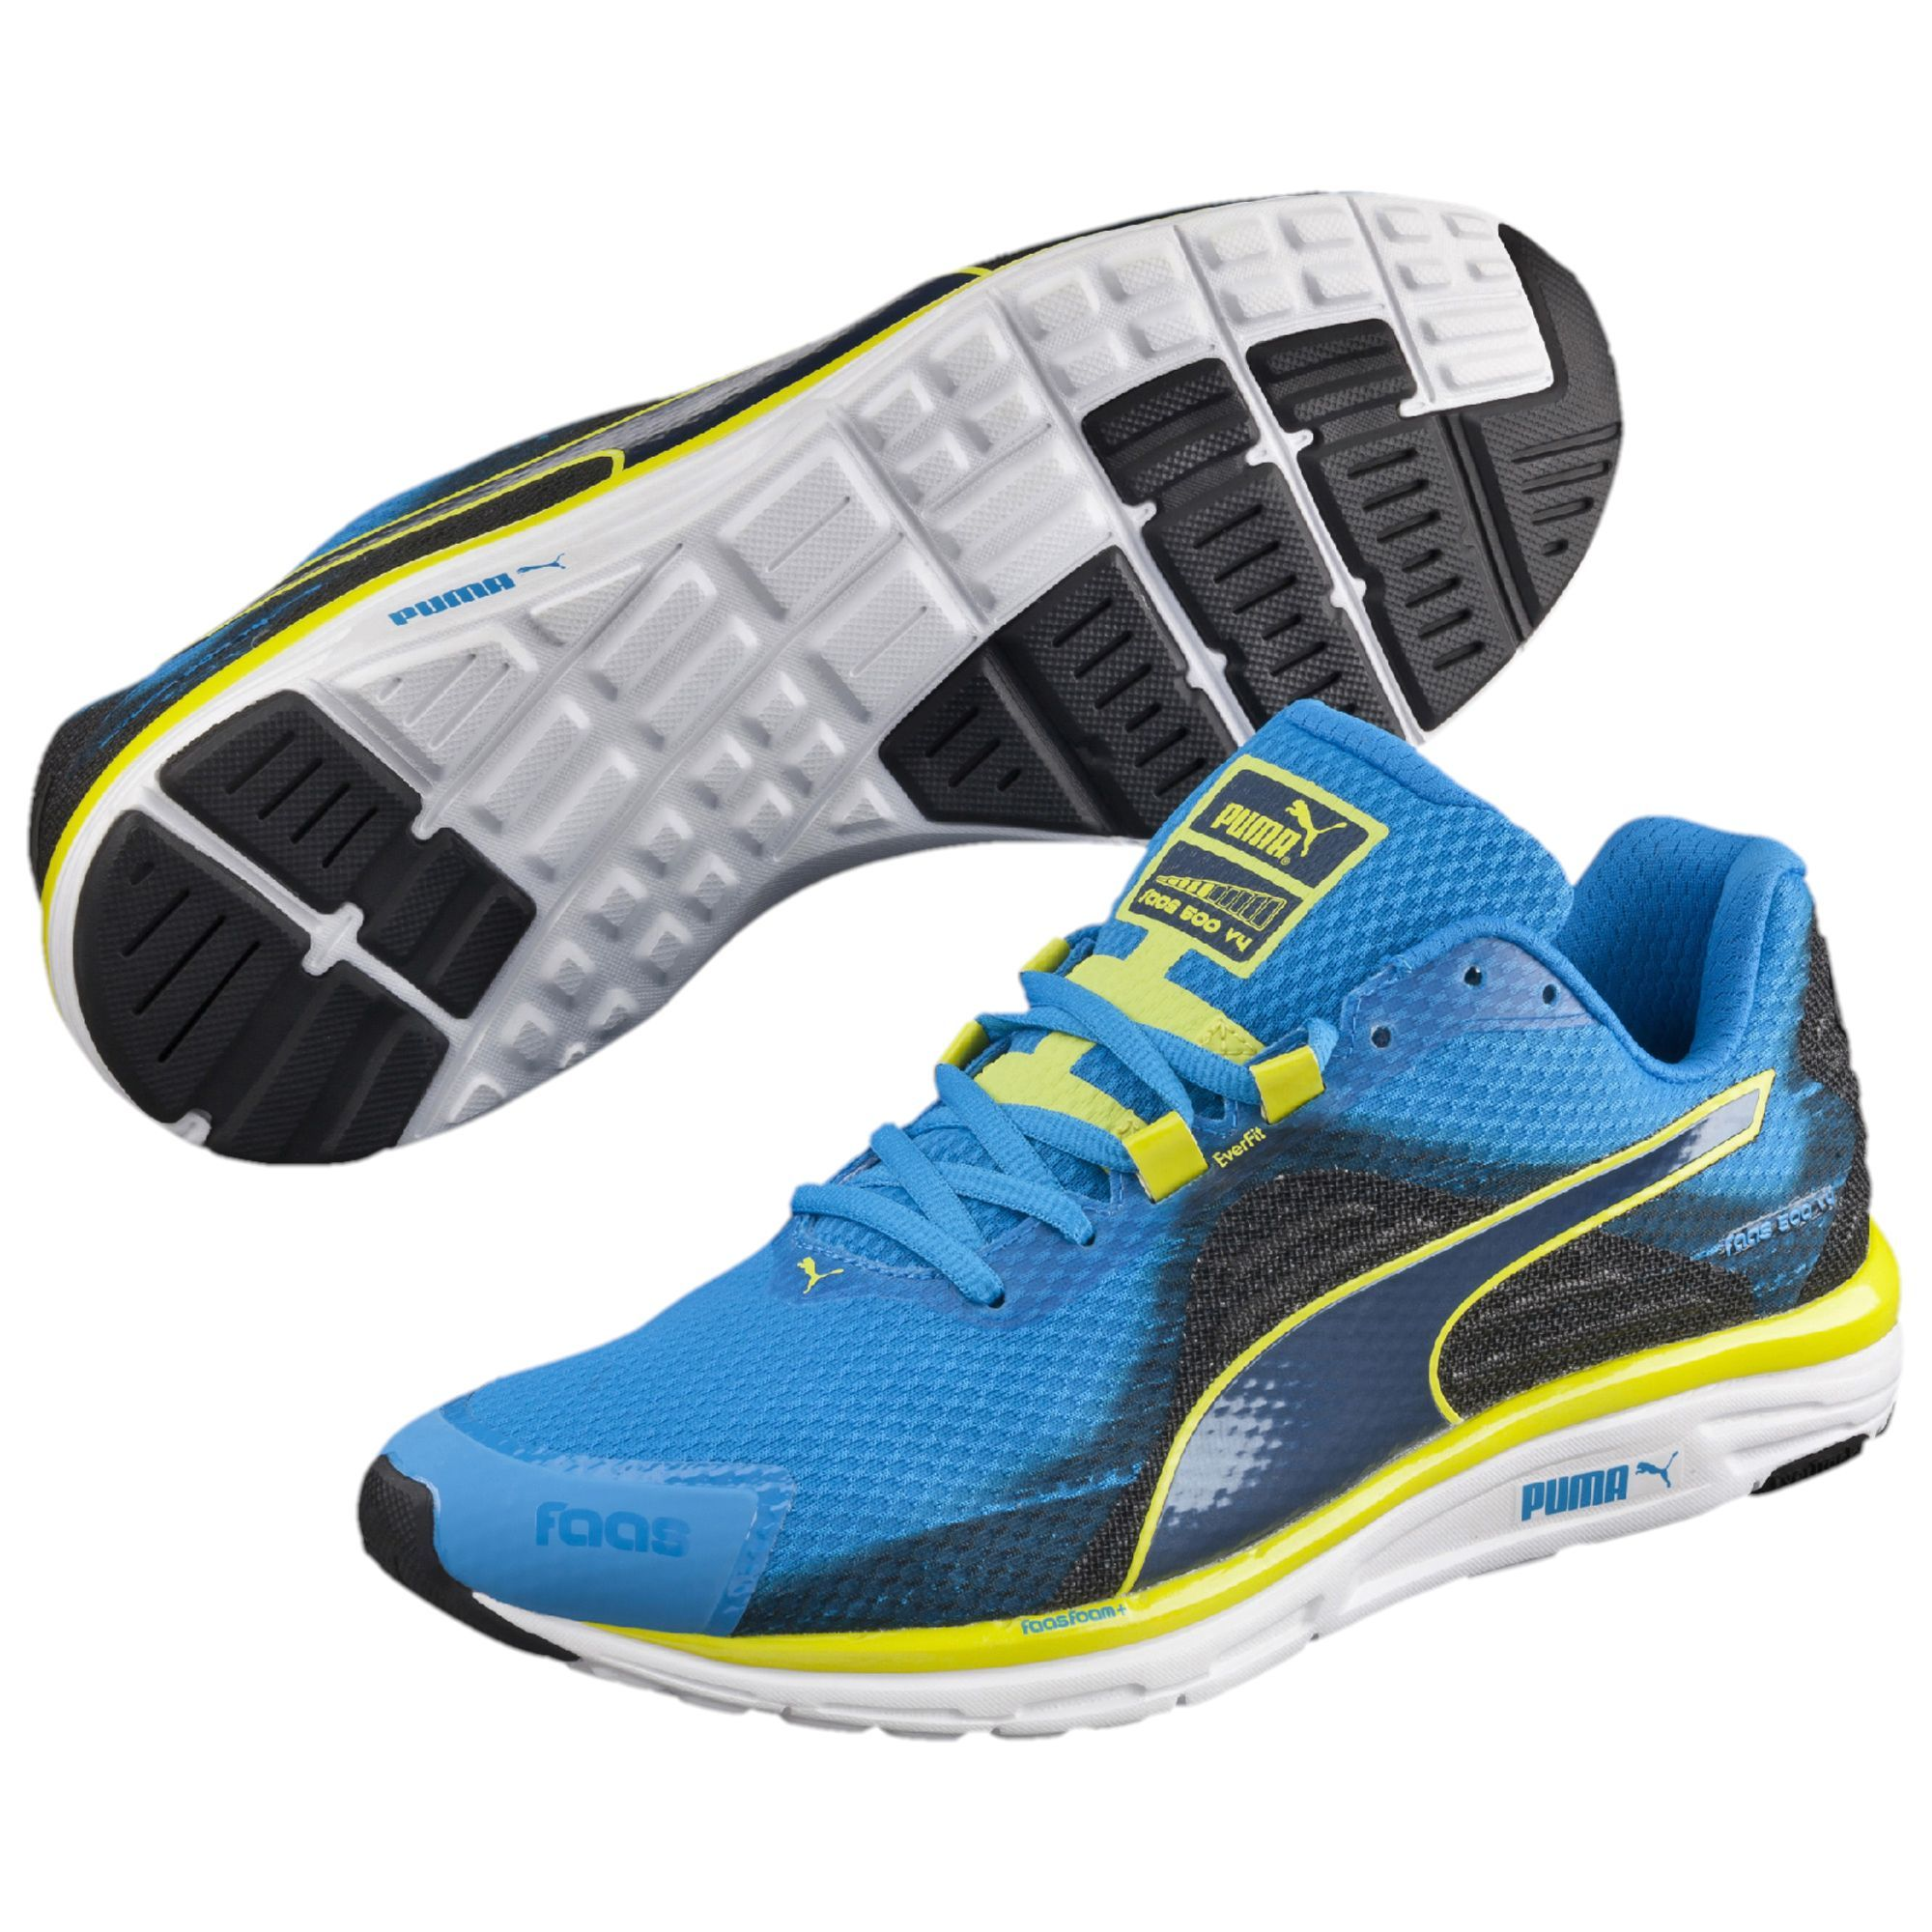 Men In Puma Tennis Shoes